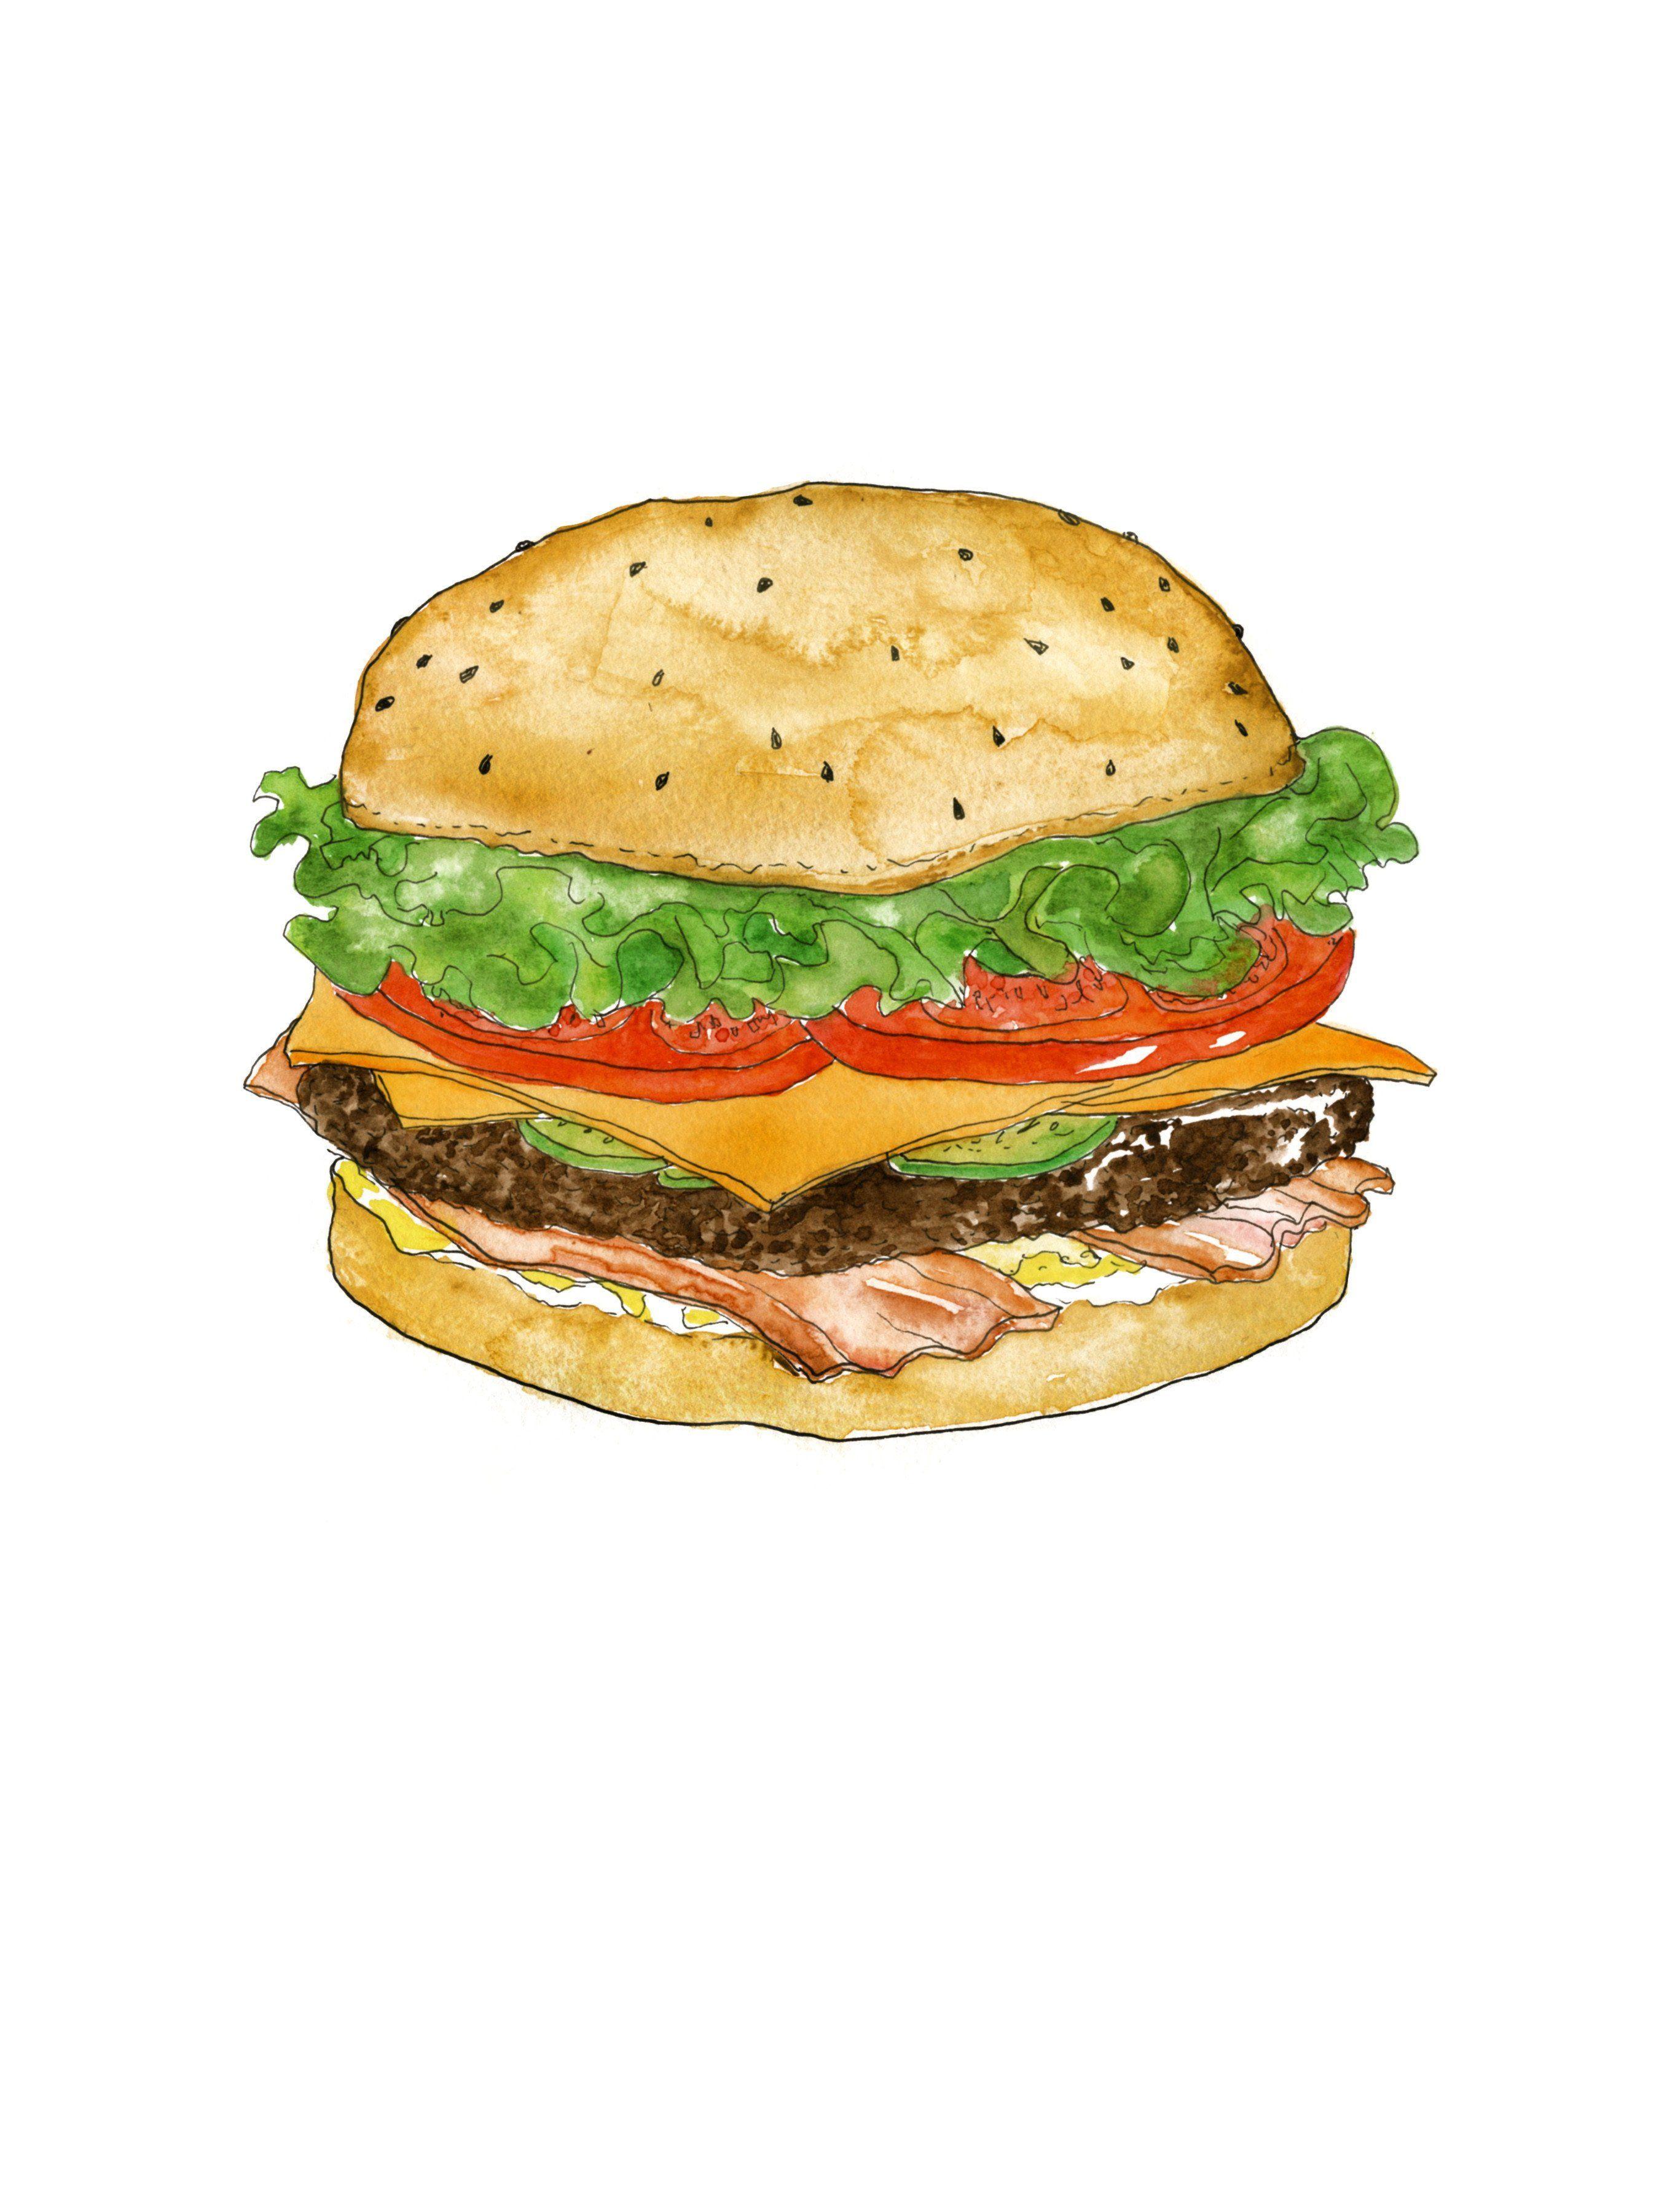 Cheeseburger clipart bacon cheeseburger. Burger watercolor art print